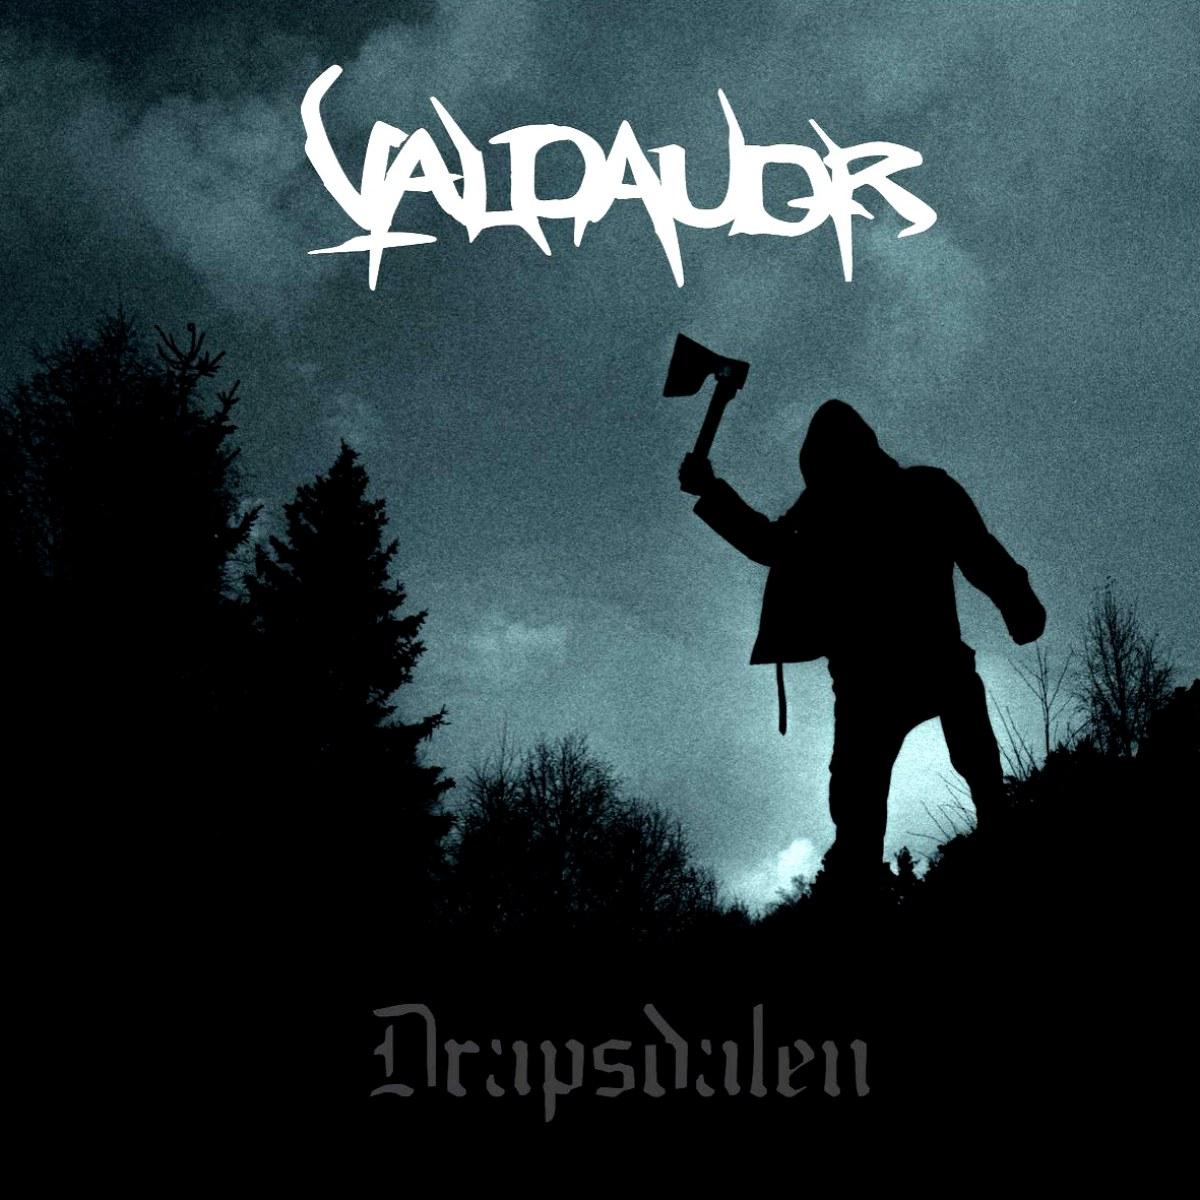 Valdaudr - Drapsdalen